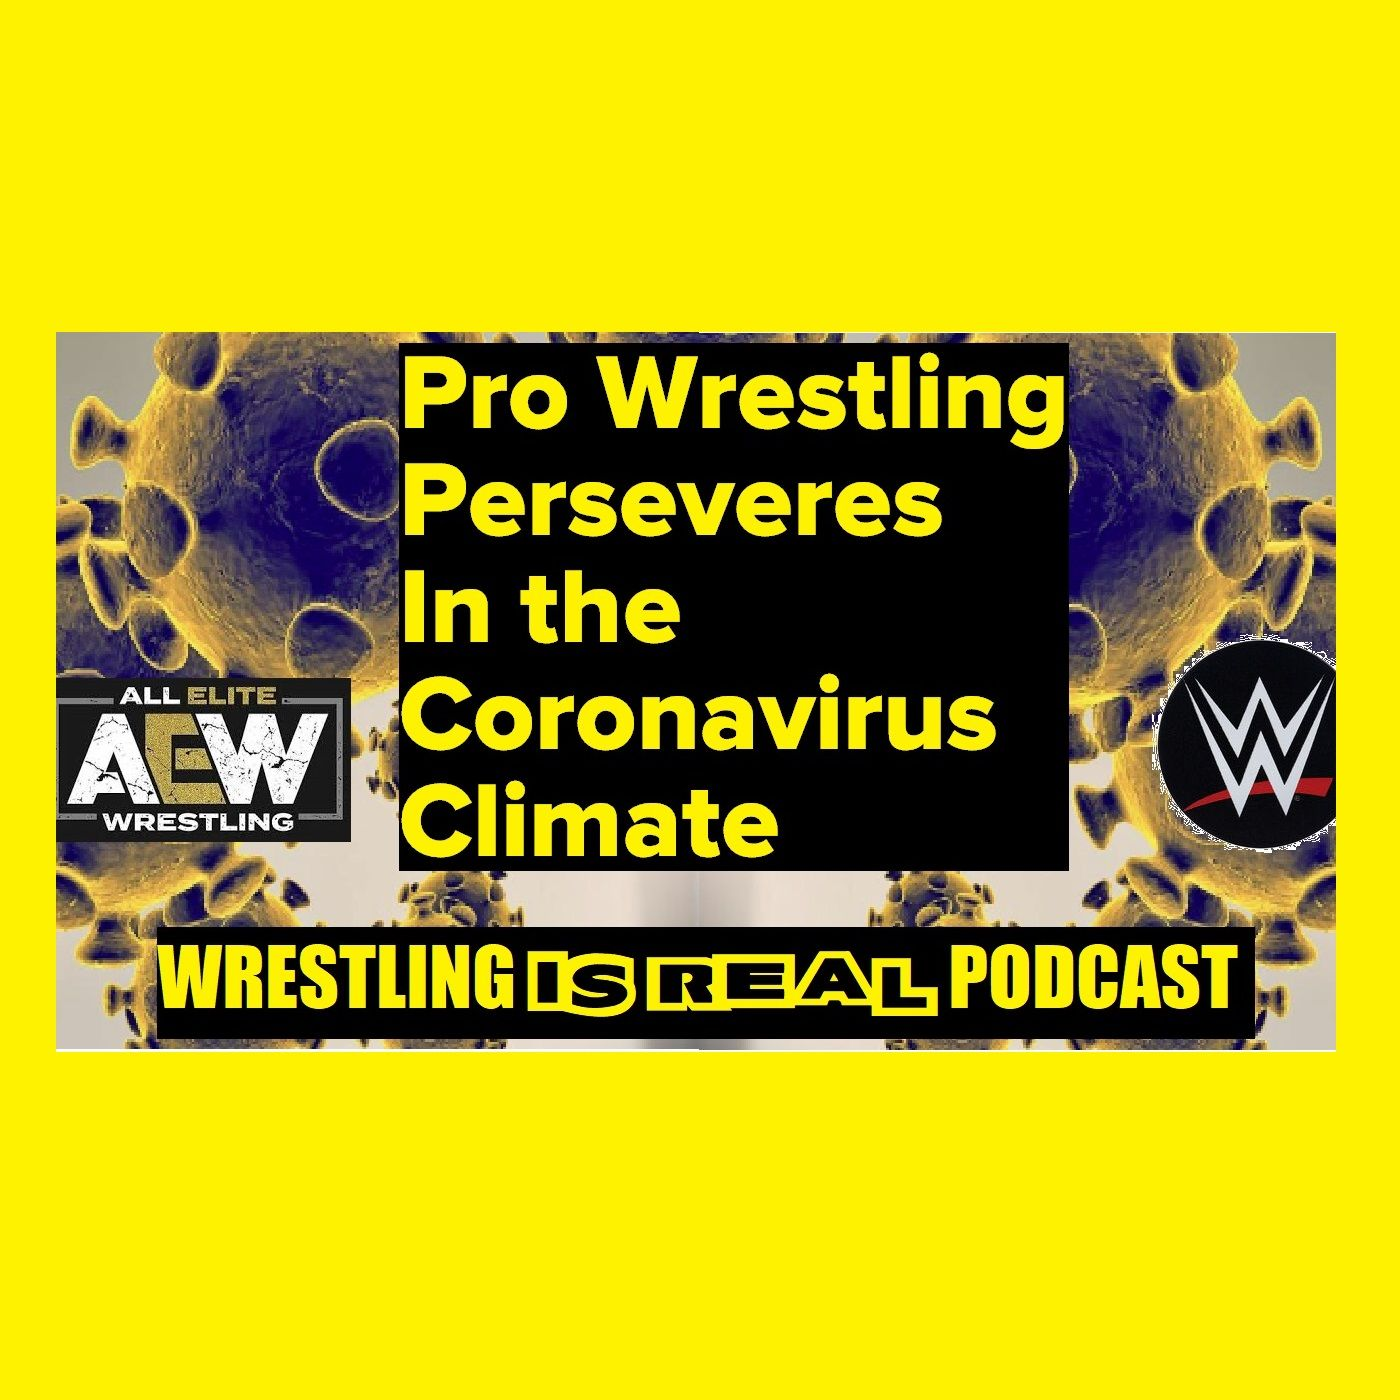 Pro Wrestling Perseveres In the Coronavirus Climate KOP031920-522